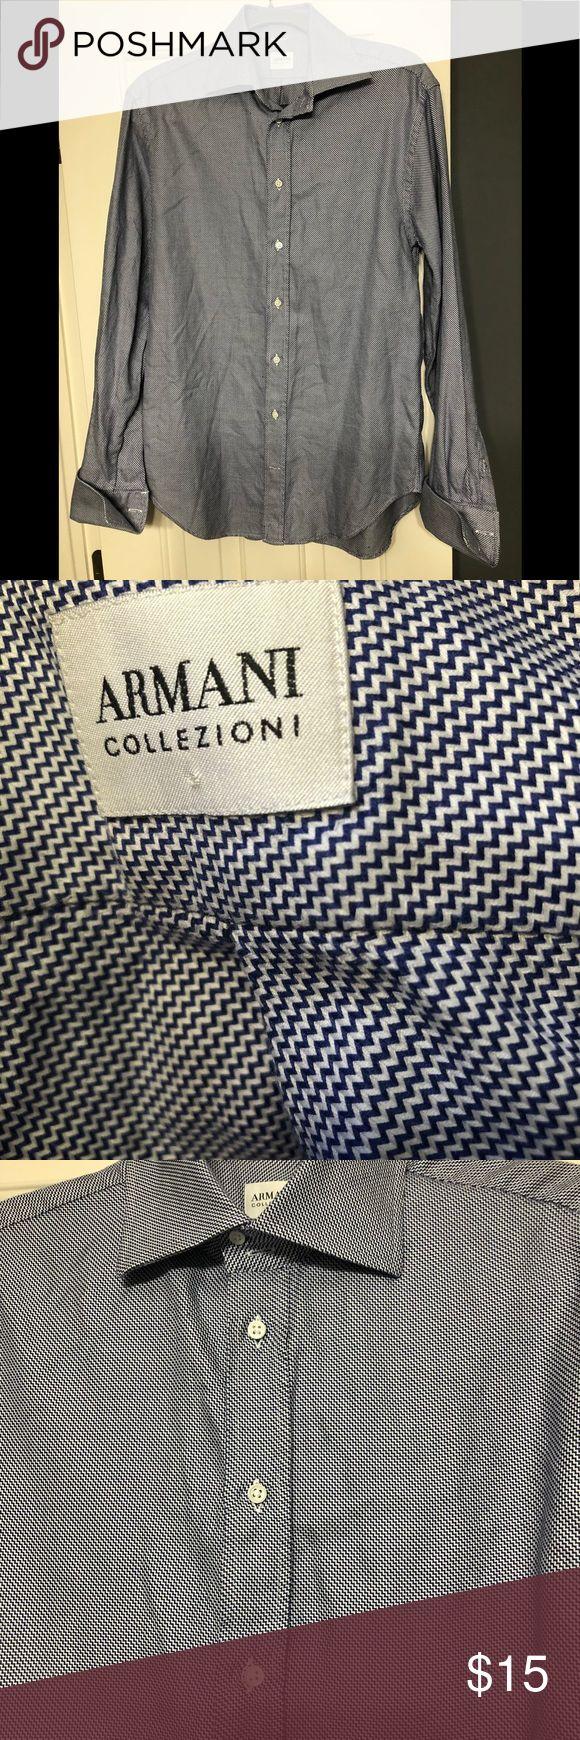 Armani designer blue M 40 shirt Nice Armani designer button down shirt in 40 Medium. French cuffs Armani Collezioni Shirts Dress Shirts